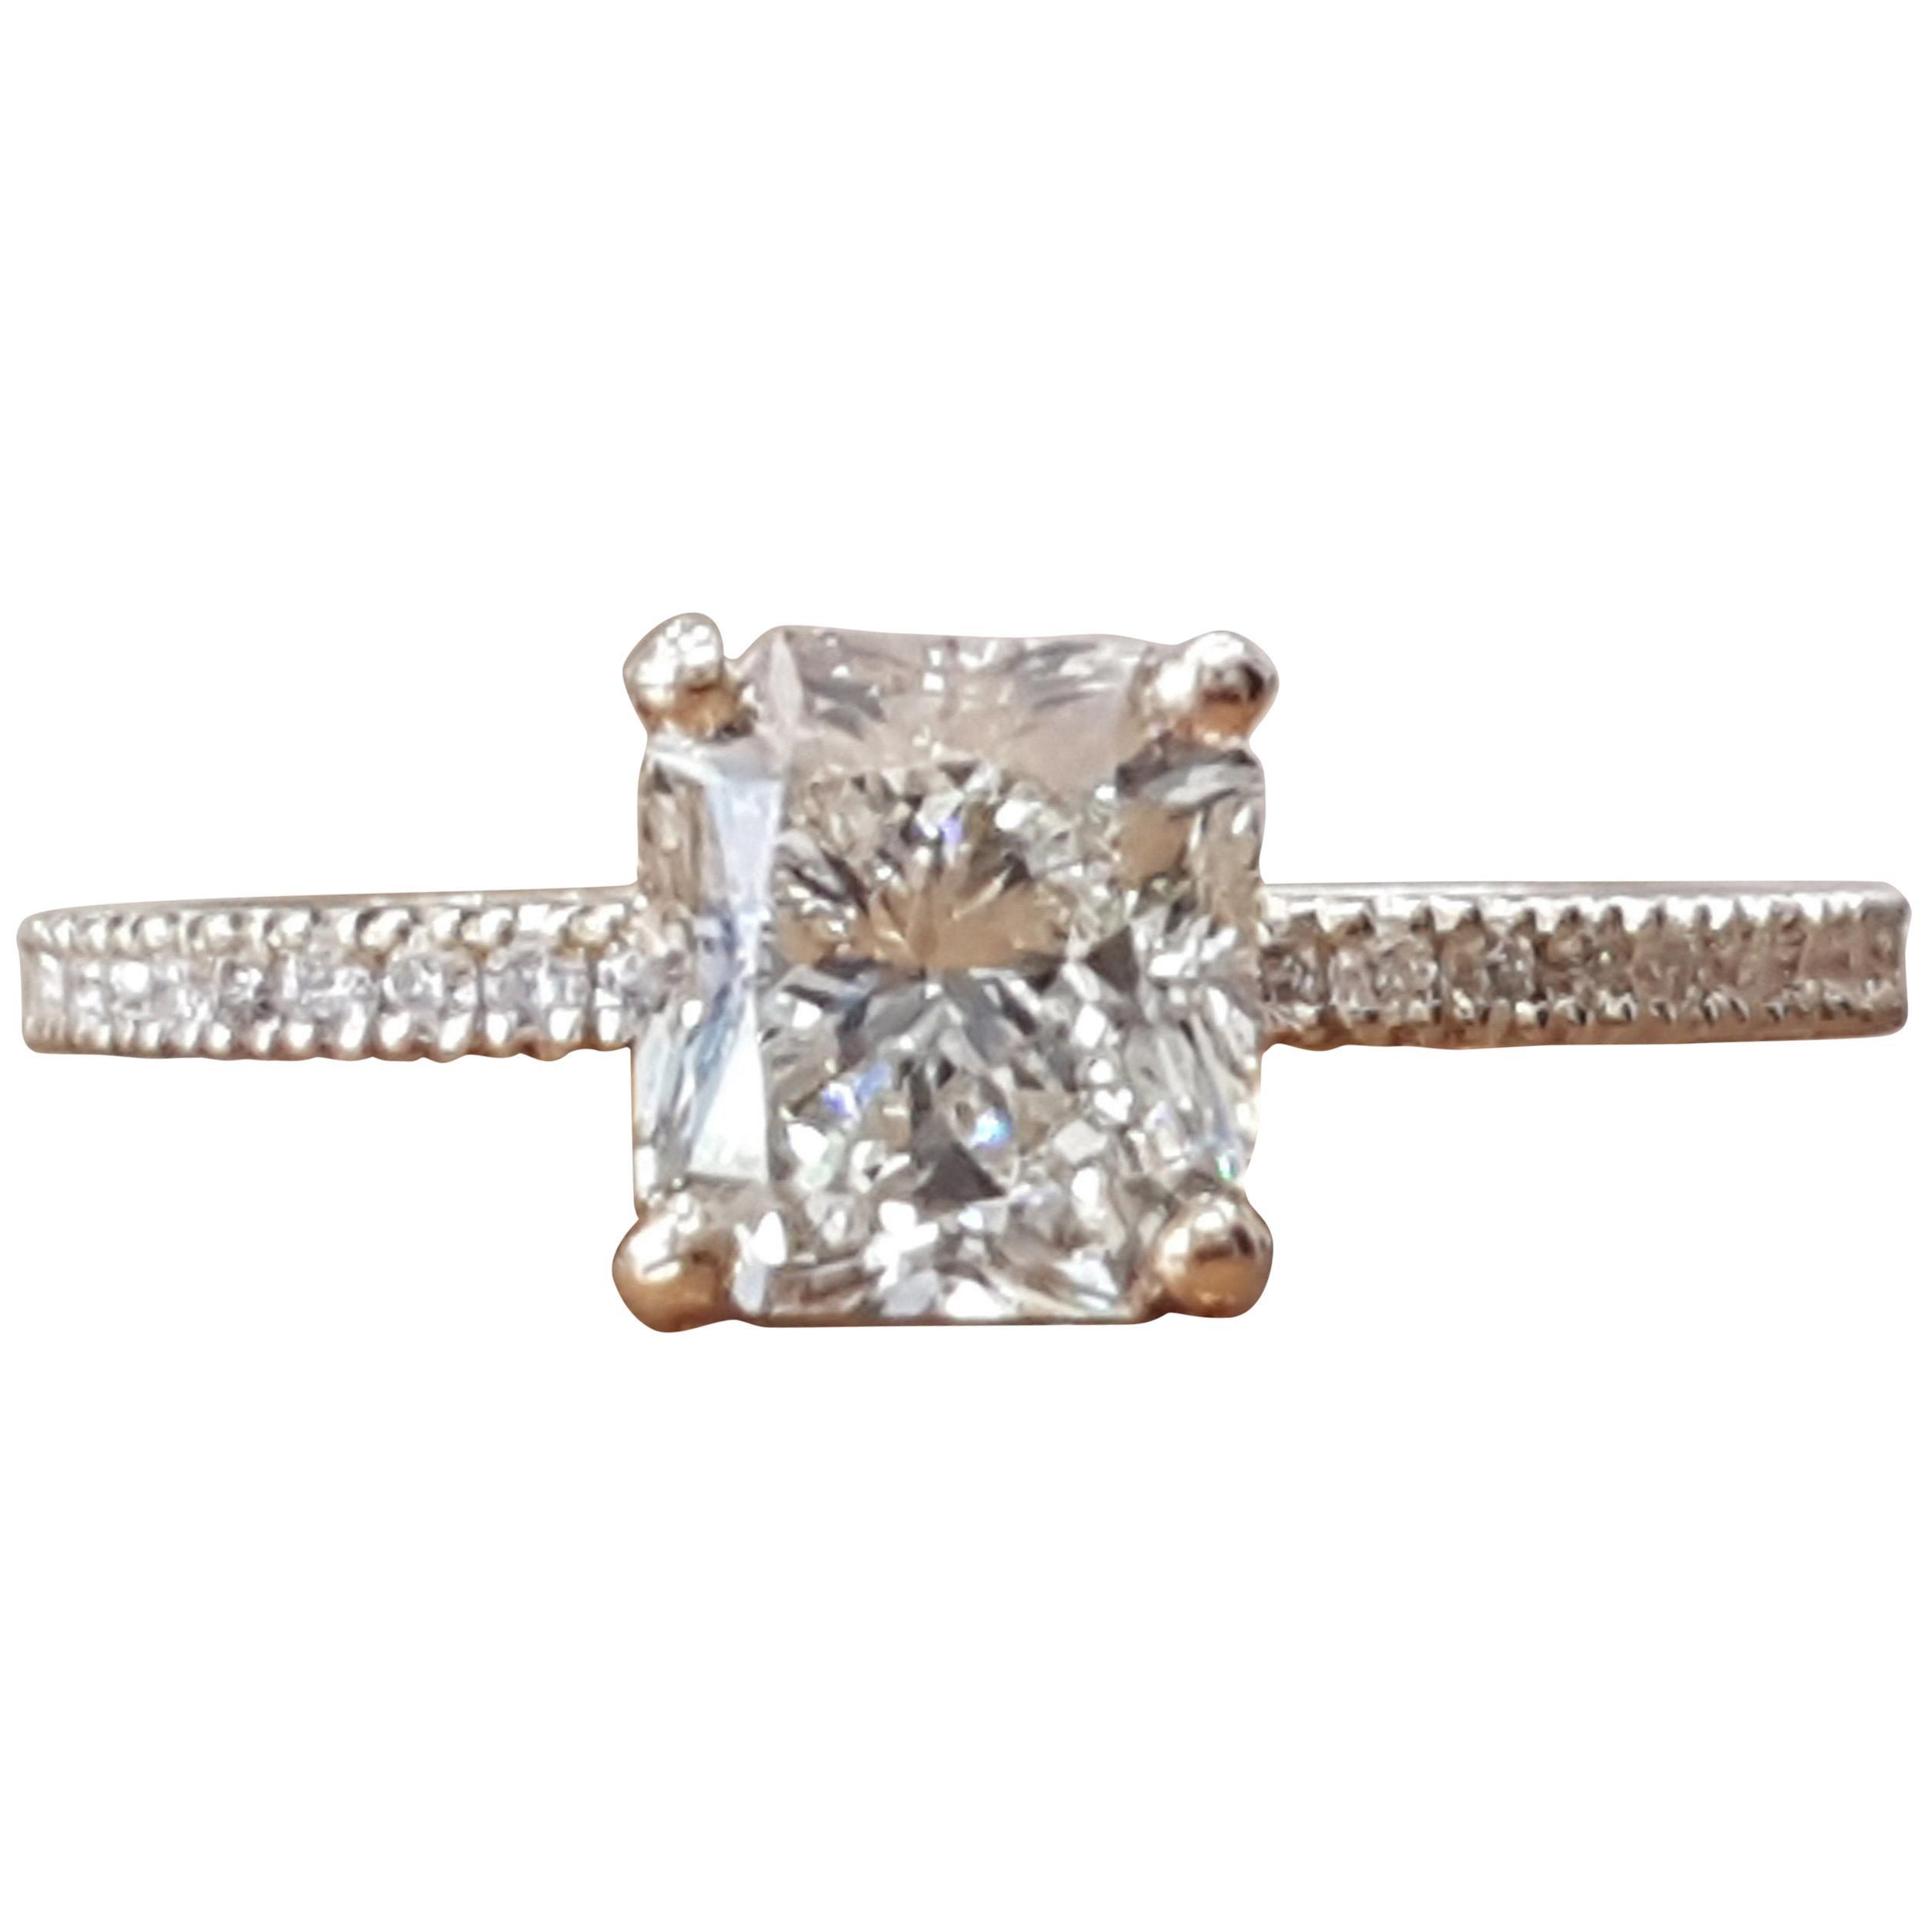 1 1/2 Carat 14 Karat White Gold Radiant Diamond Ring, Classic Style Ring